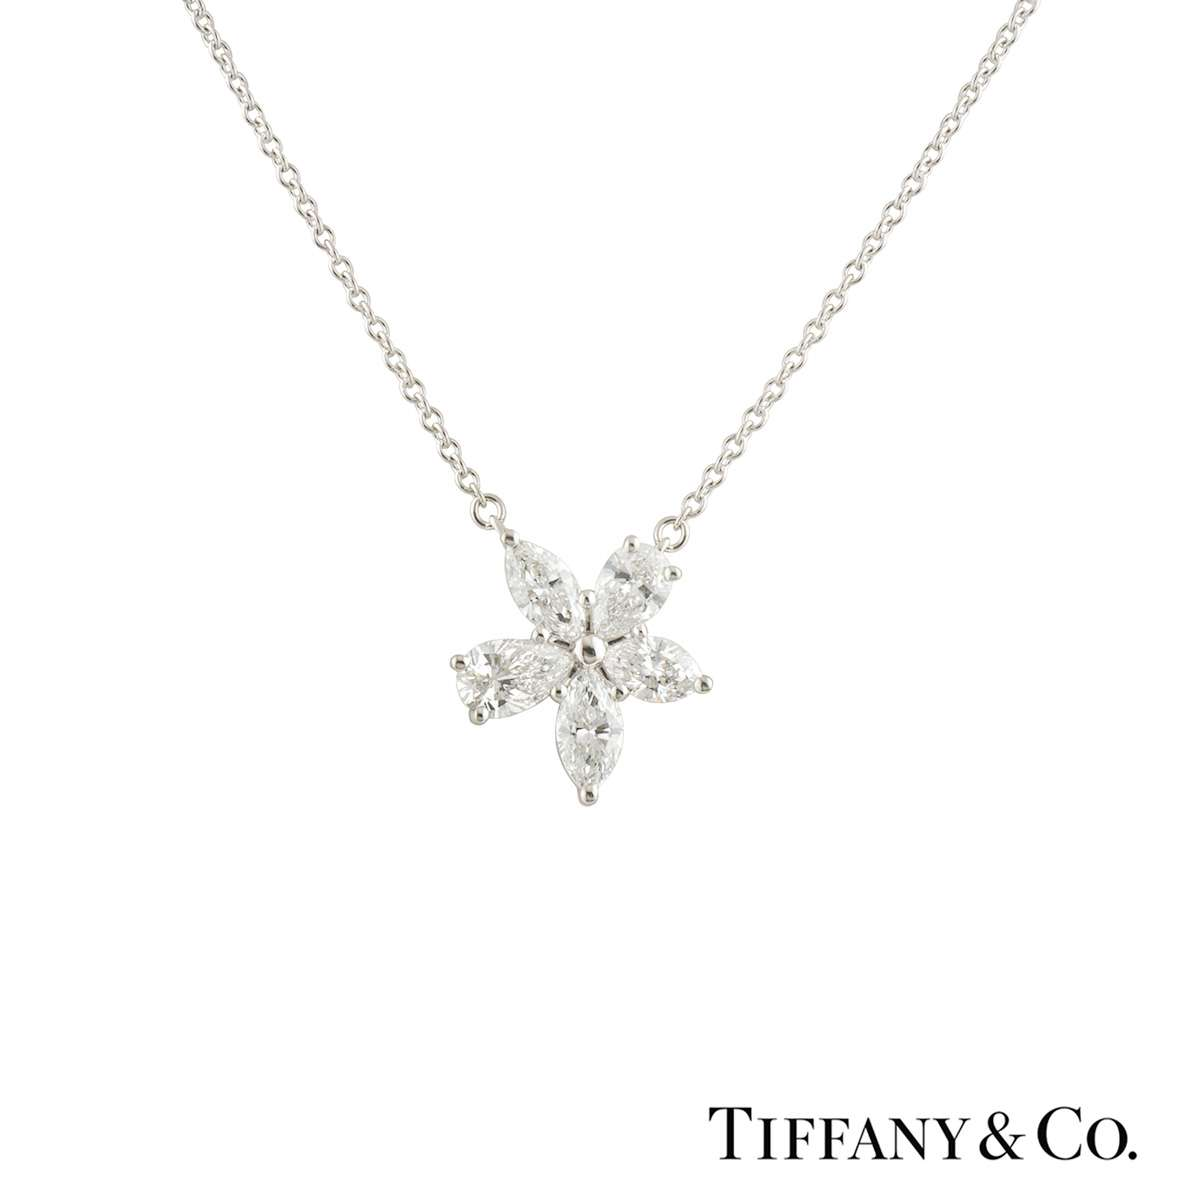 Tiffany & Co. Platinum Diamond Mixed Cluster Victoria Pendant